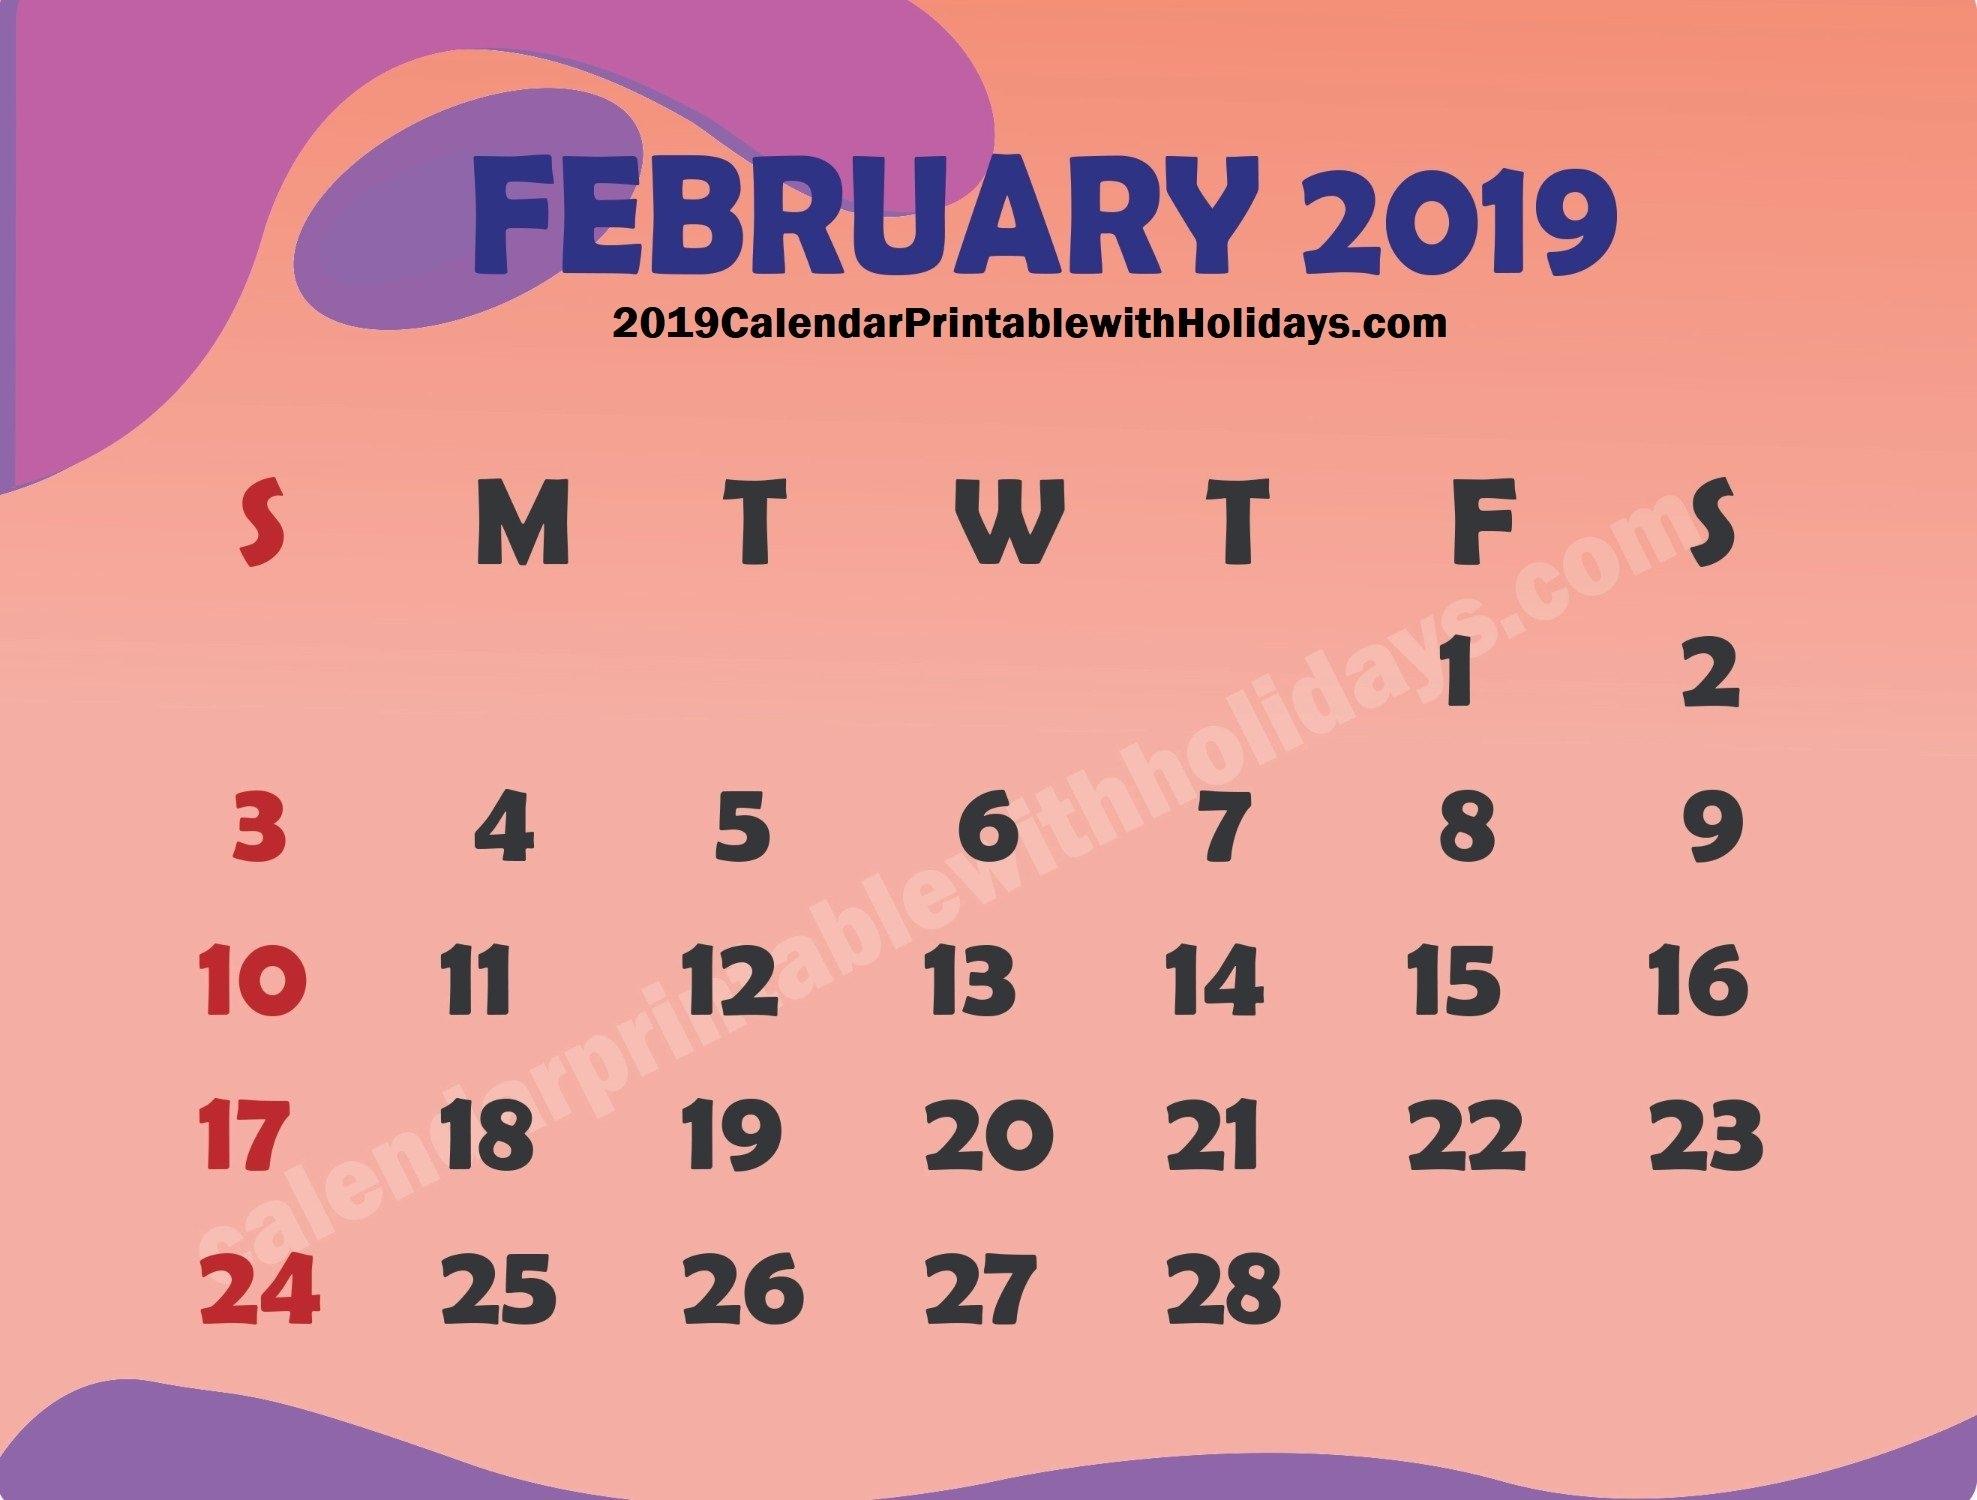 February 2019 Calendar – 2019 Calendar Printable With Holidays Template Feb 9 2019 Calendar